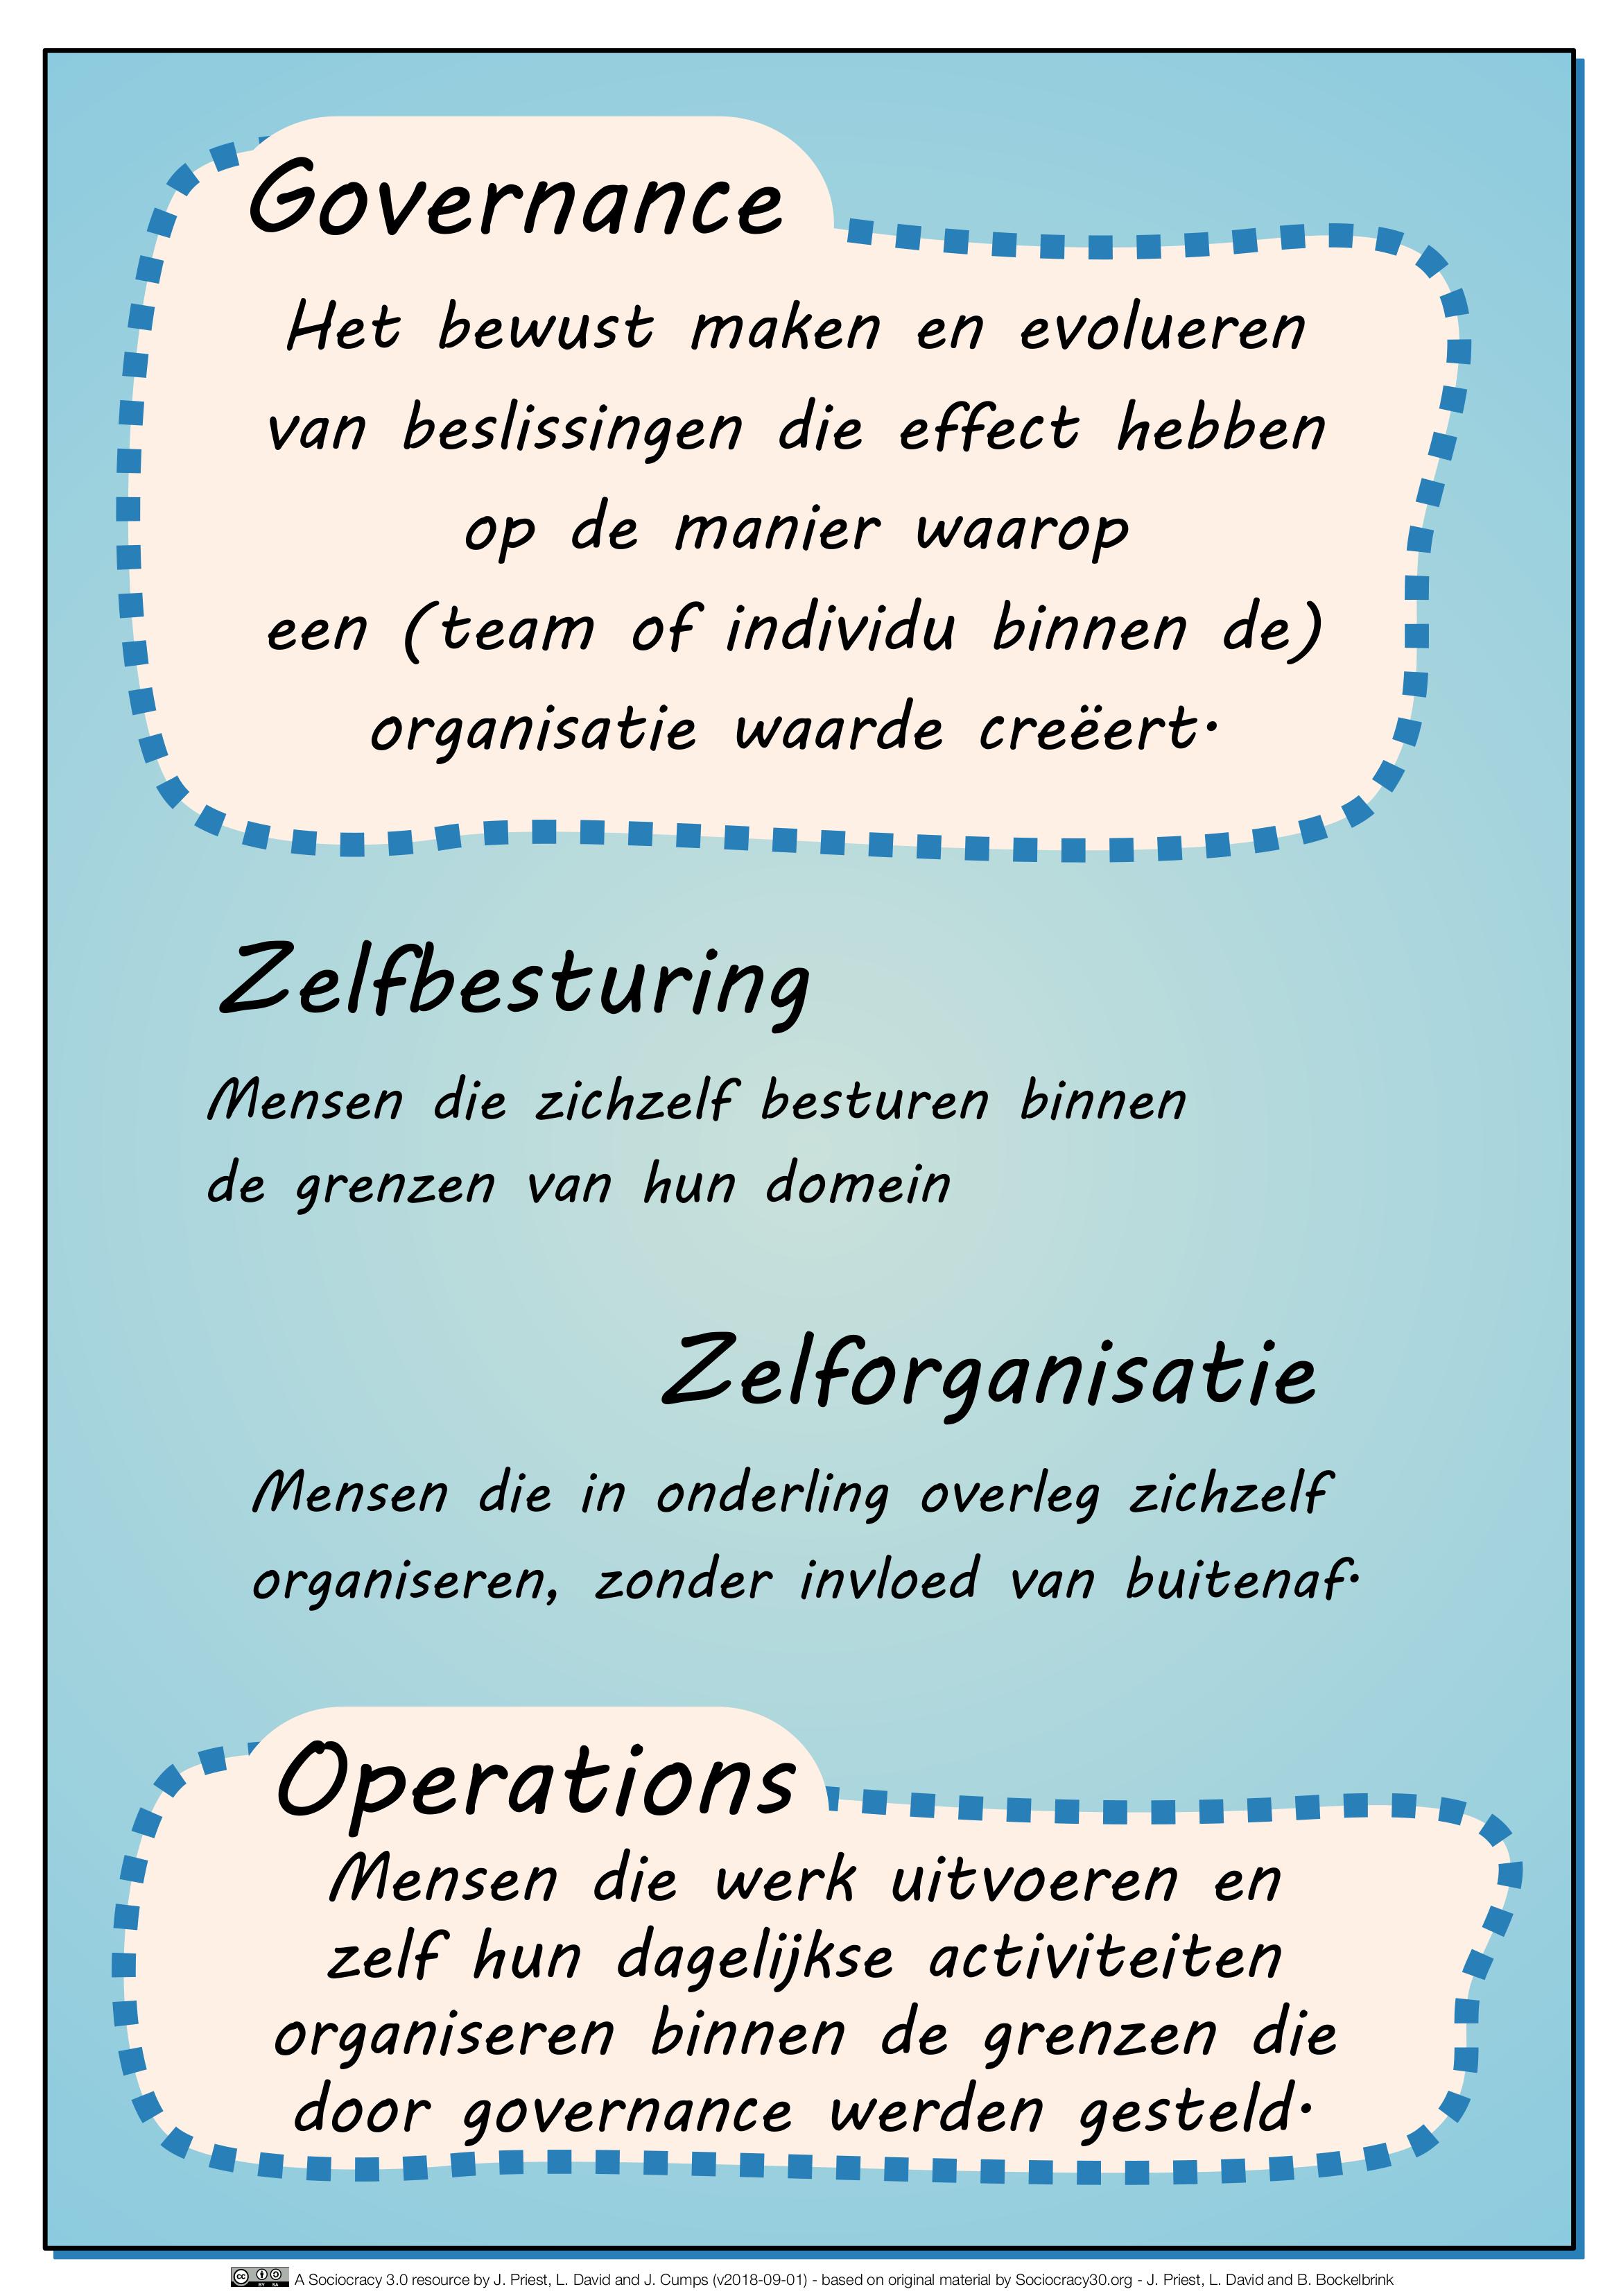 Governance_NL-A1.png